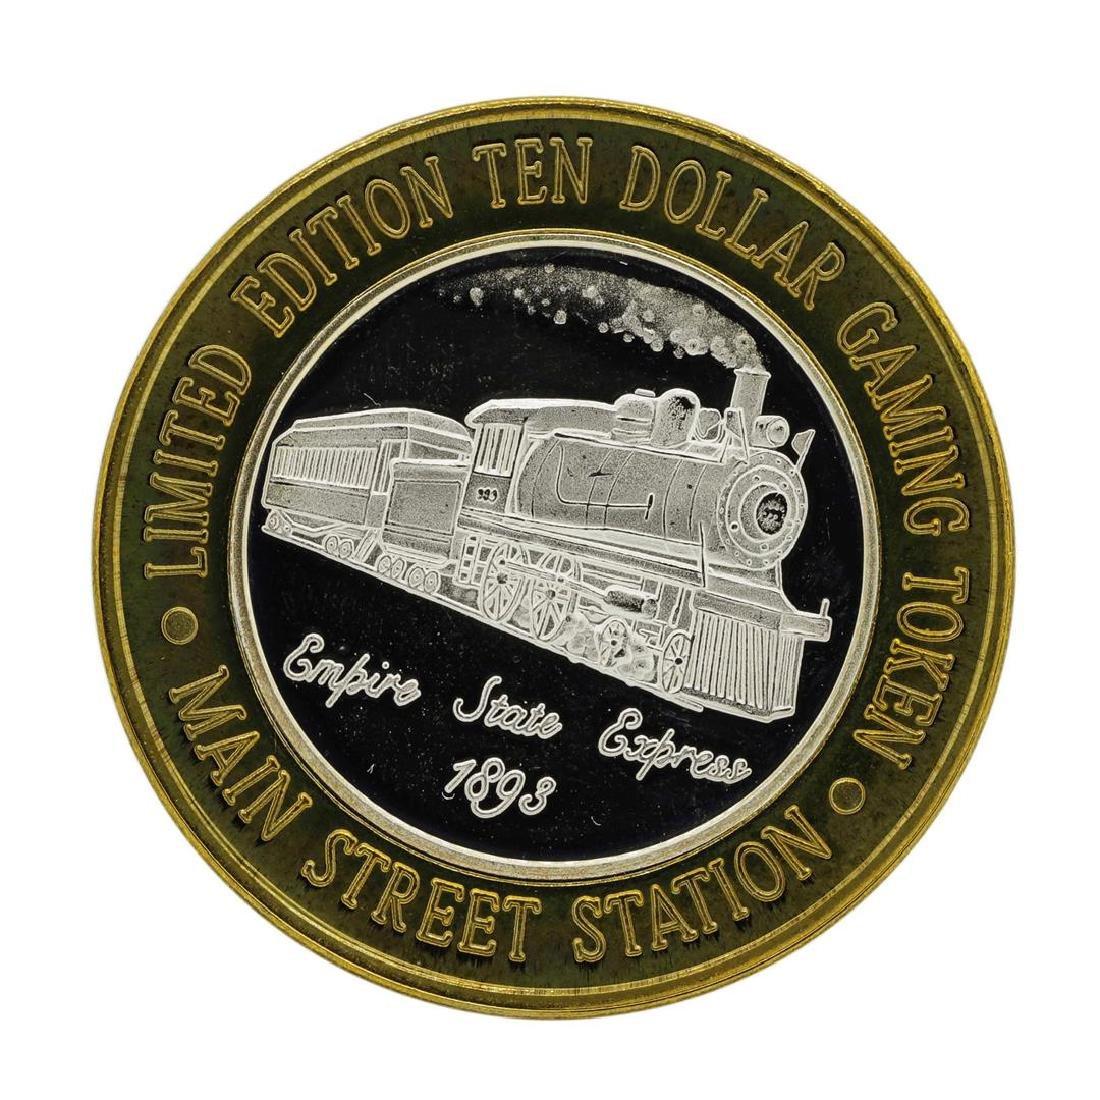 .999 Silver Main Street Station Las Vegas, NV $10